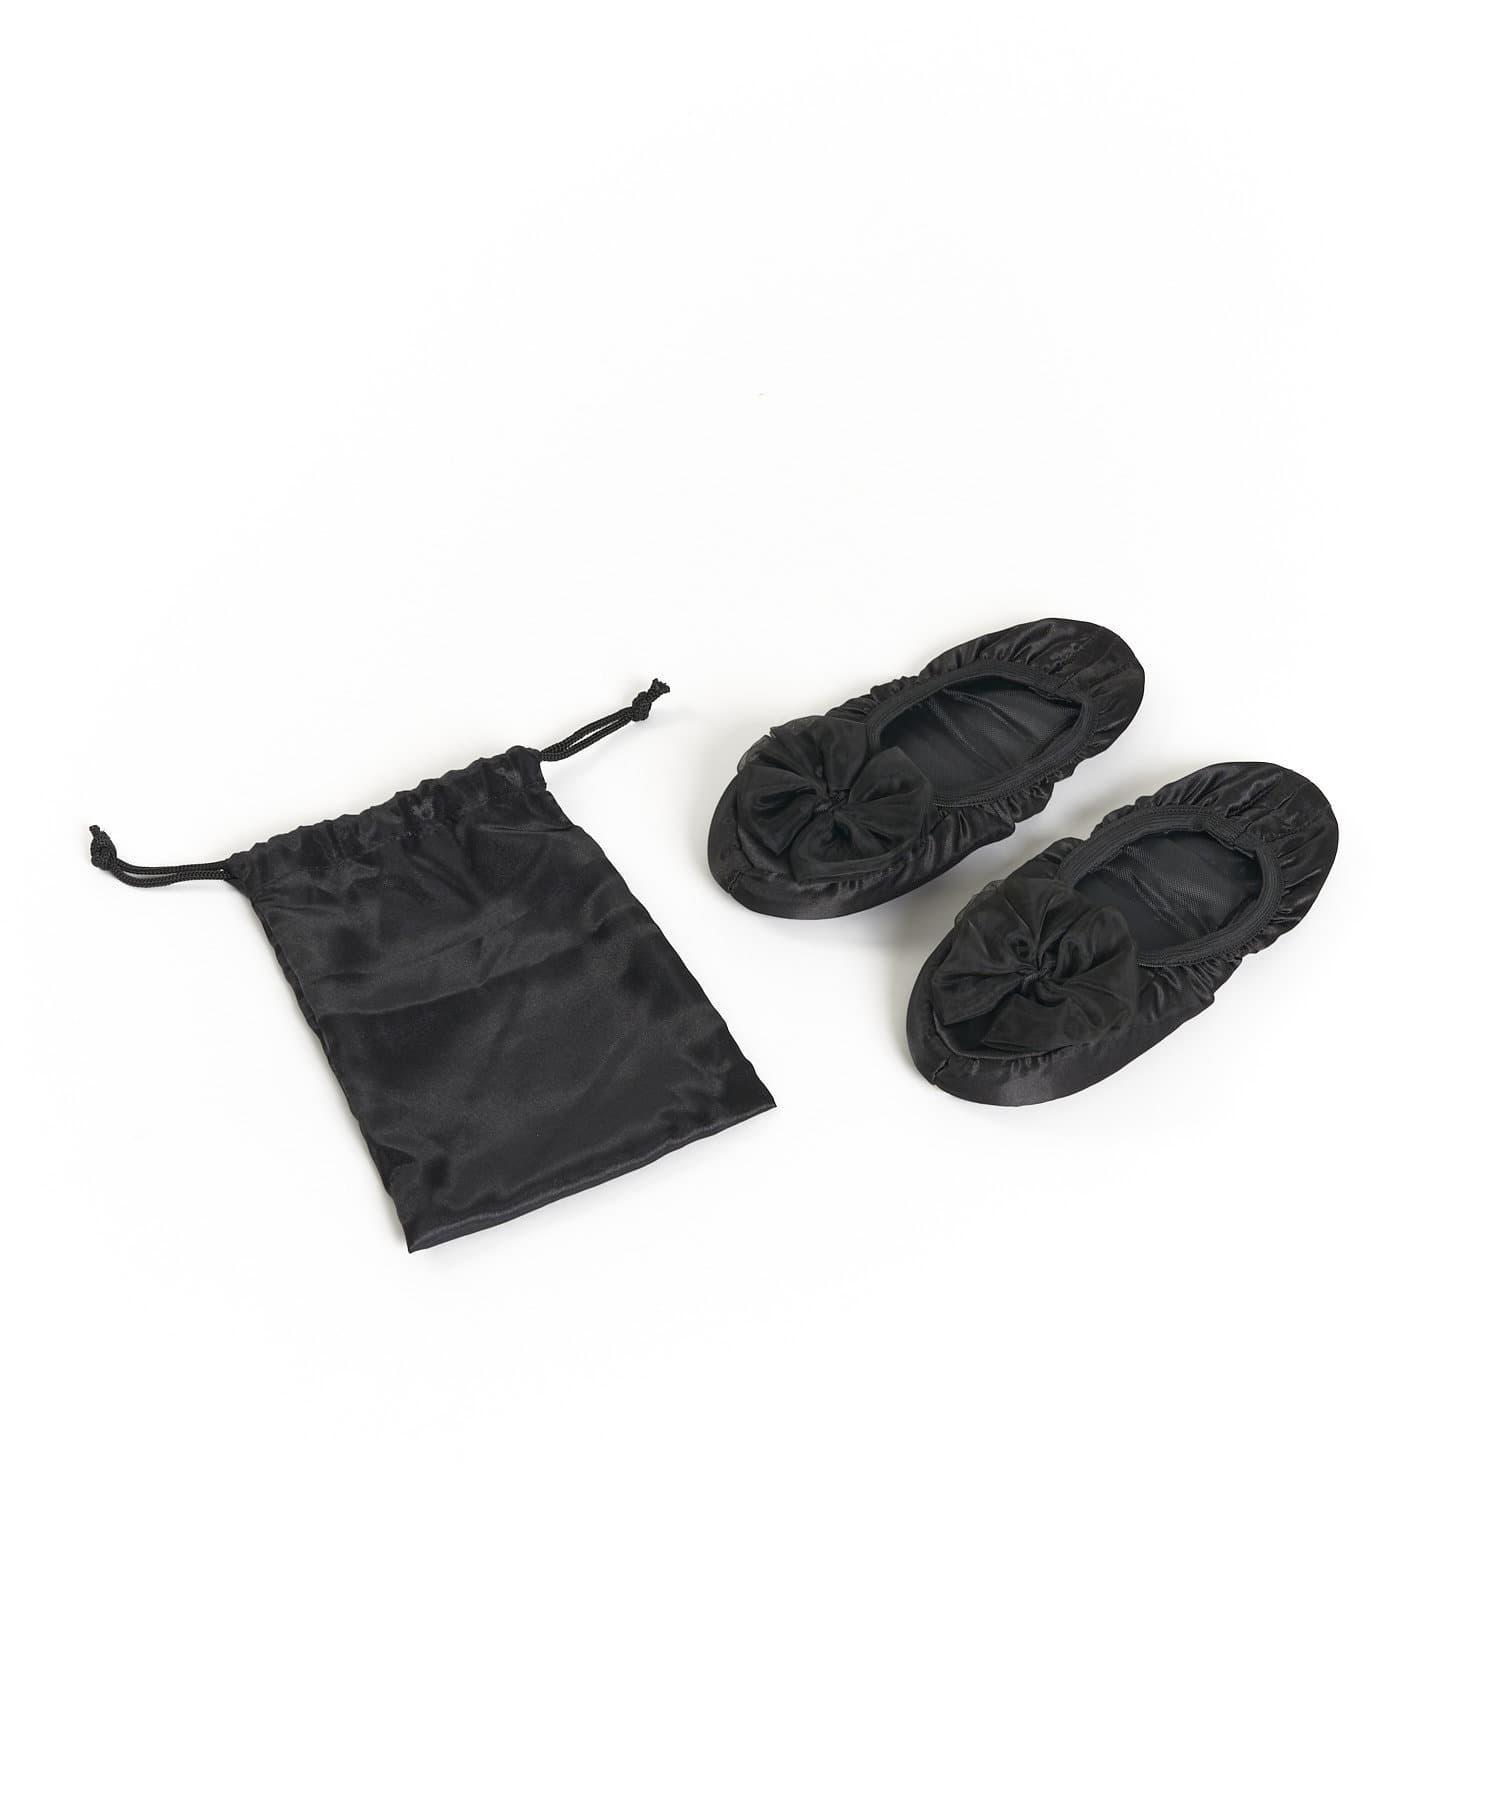 3COINS(スリーコインズ) ライフスタイル シフォンリボン付きスリッパ ブラック